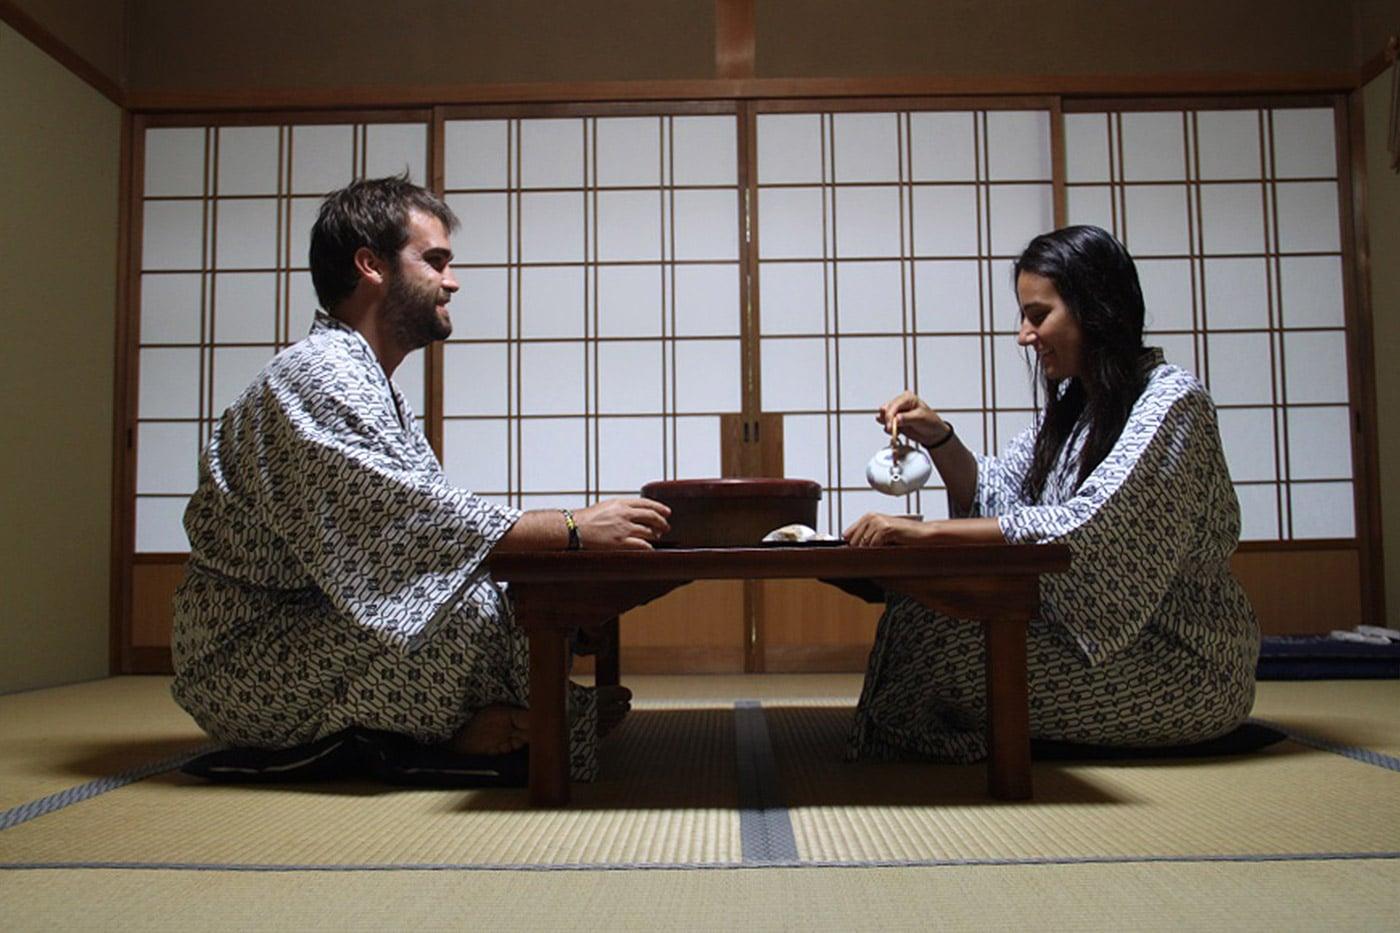 Alojamiento en un templo en Koyasan